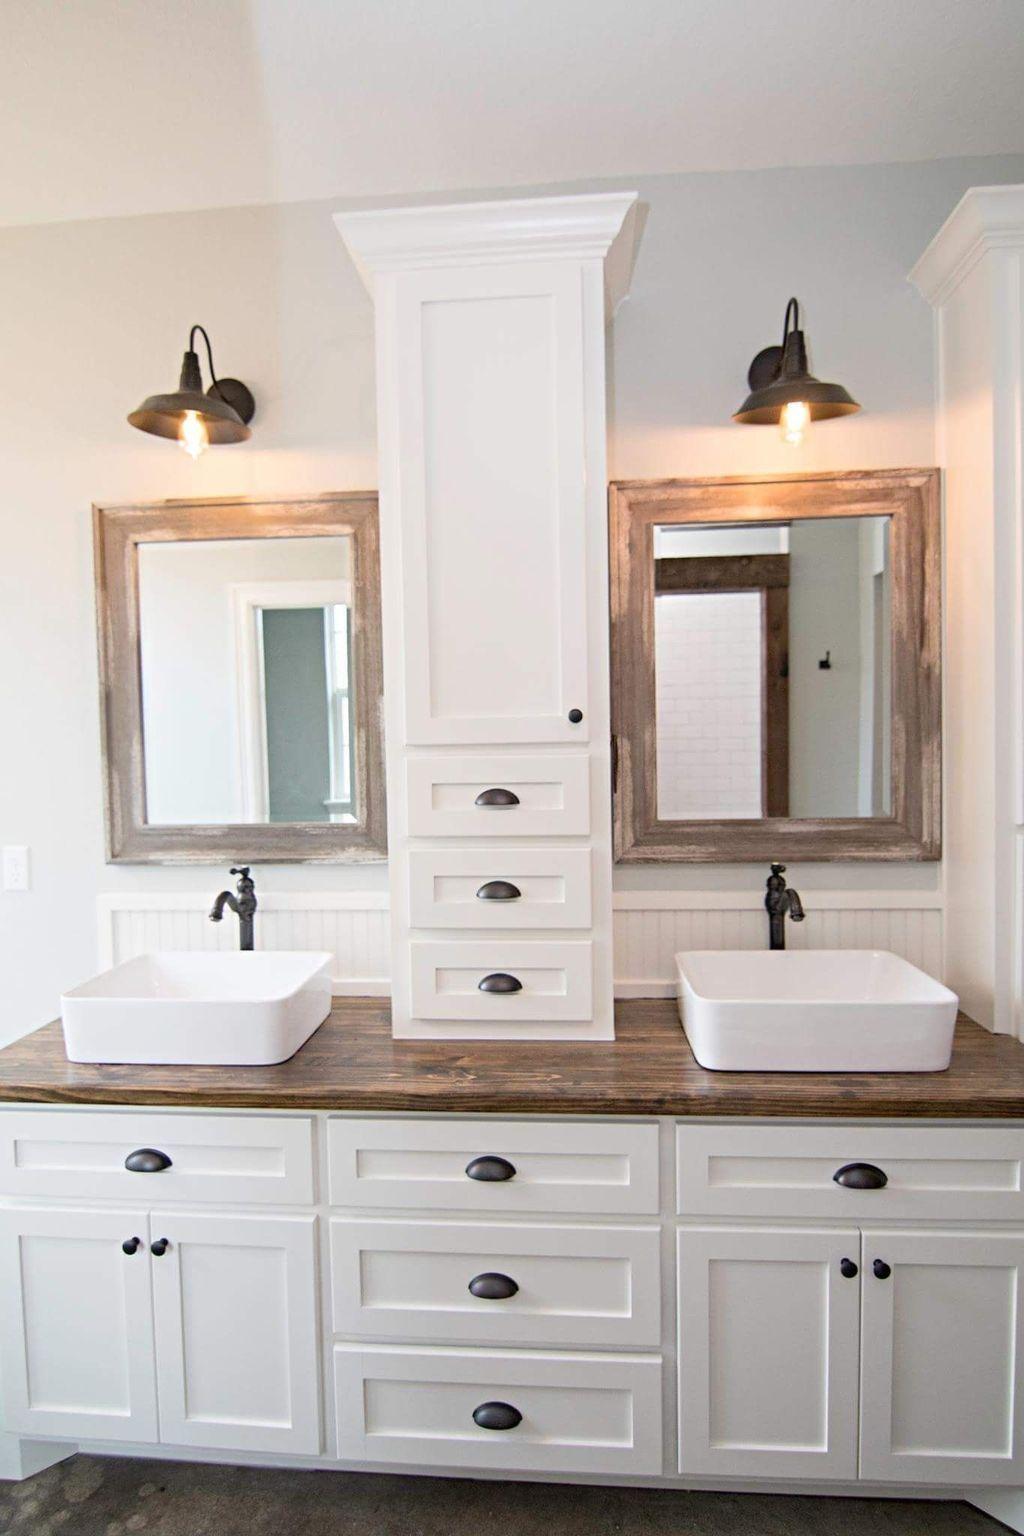 30 Awesome Master Bathroom Remodel Ideas On A Budget Coodecor Modern Farmhouse Bathroom Bathroom Vanity Designs Bathroom Remodel Master